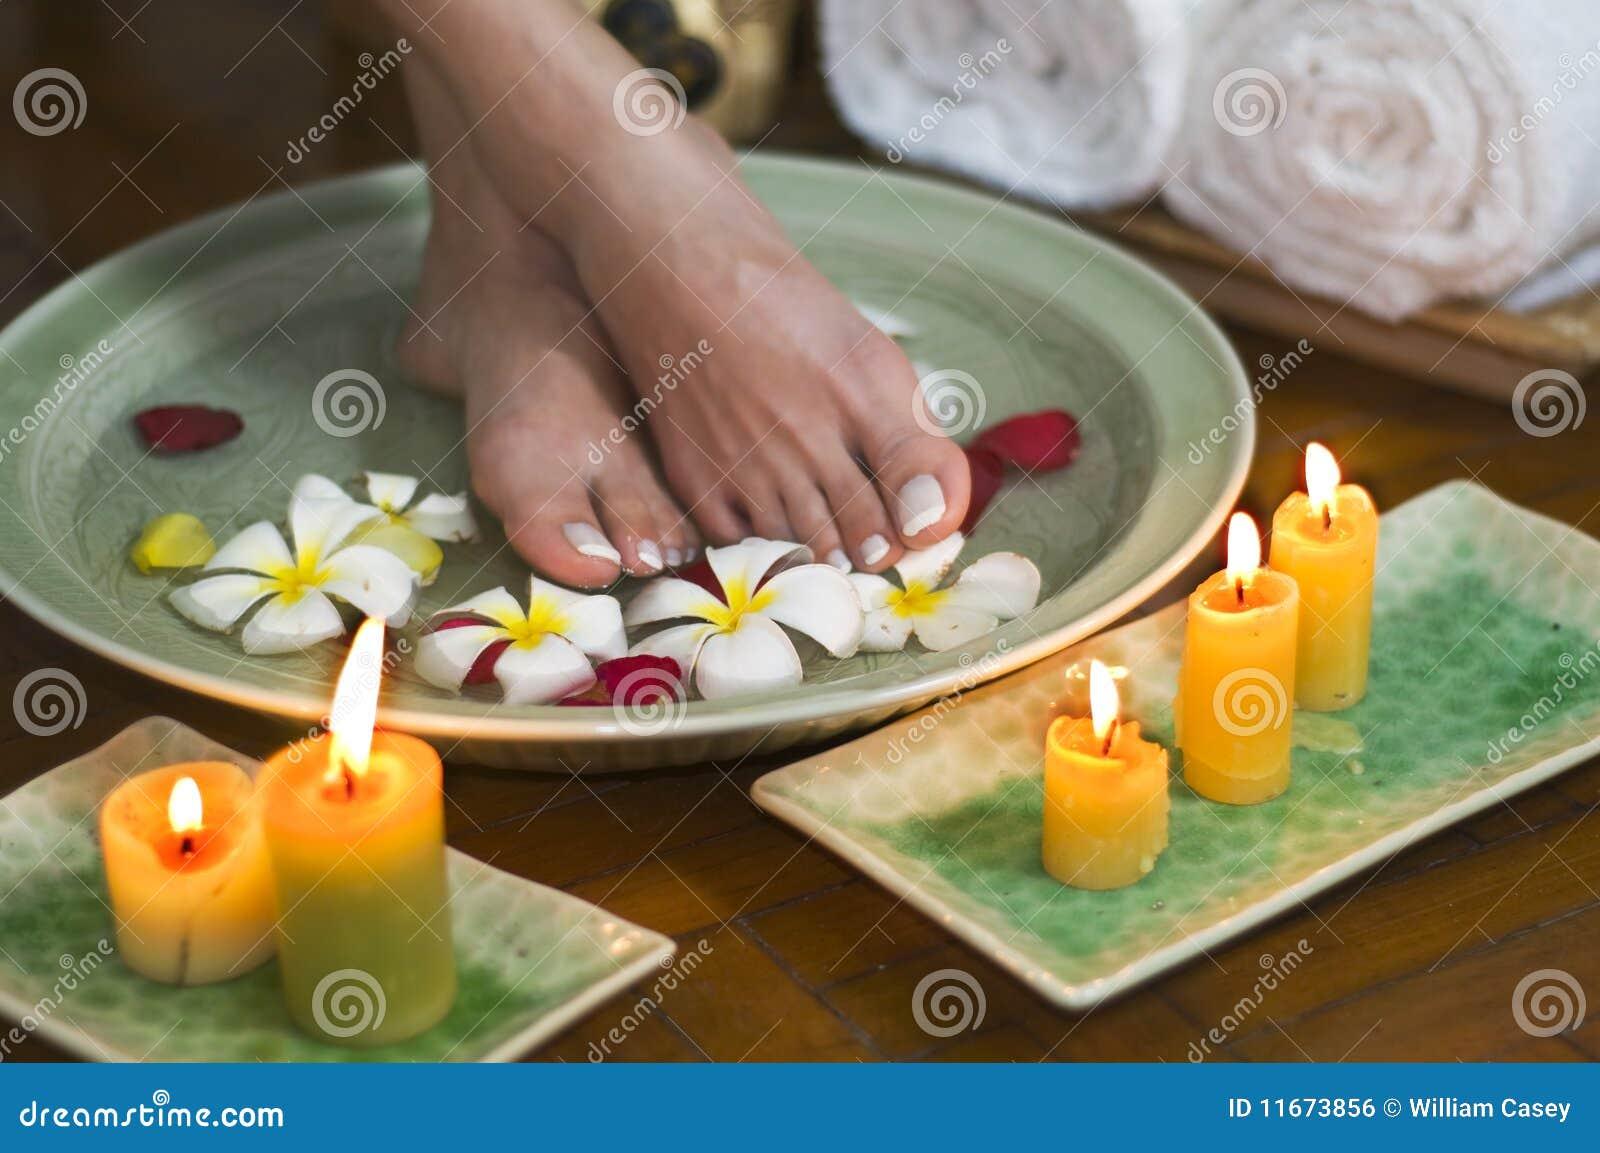 Termas aromatherapy de relaxamento para os pés 7